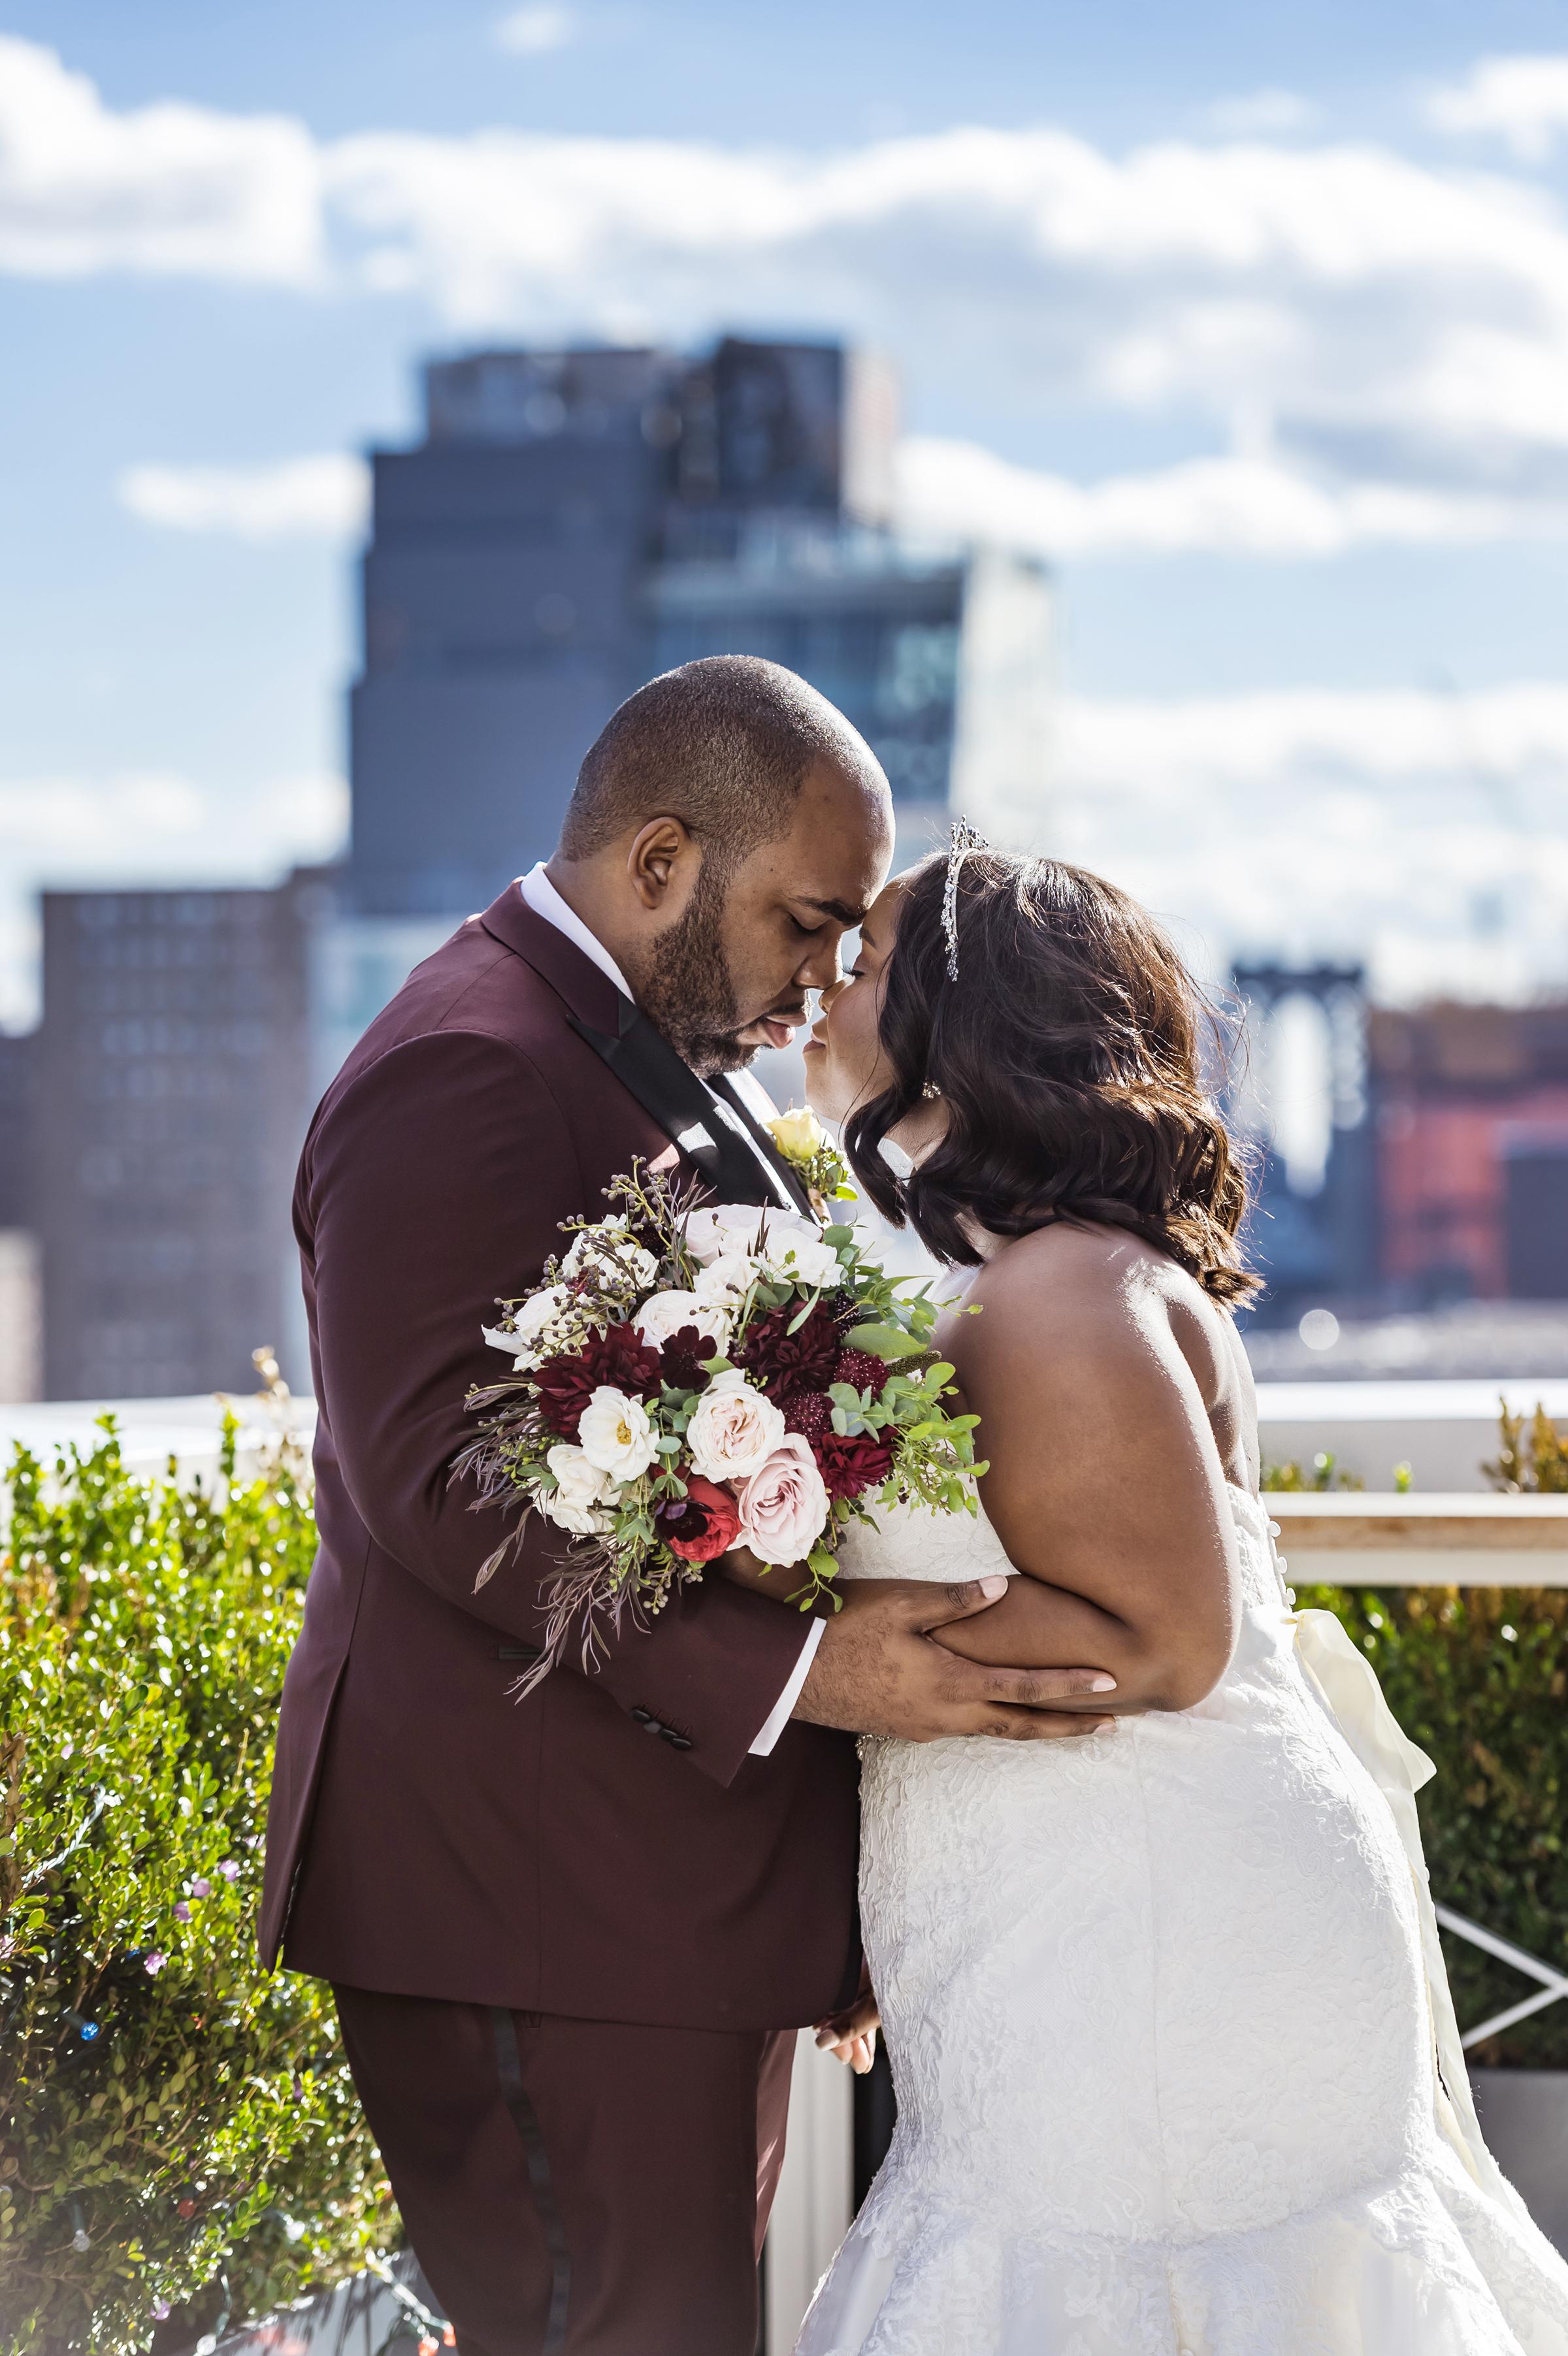 victorious-events-nyc-025-yanique-rondel-greenpoint-loft-wedding-amy-anaiz.jpg